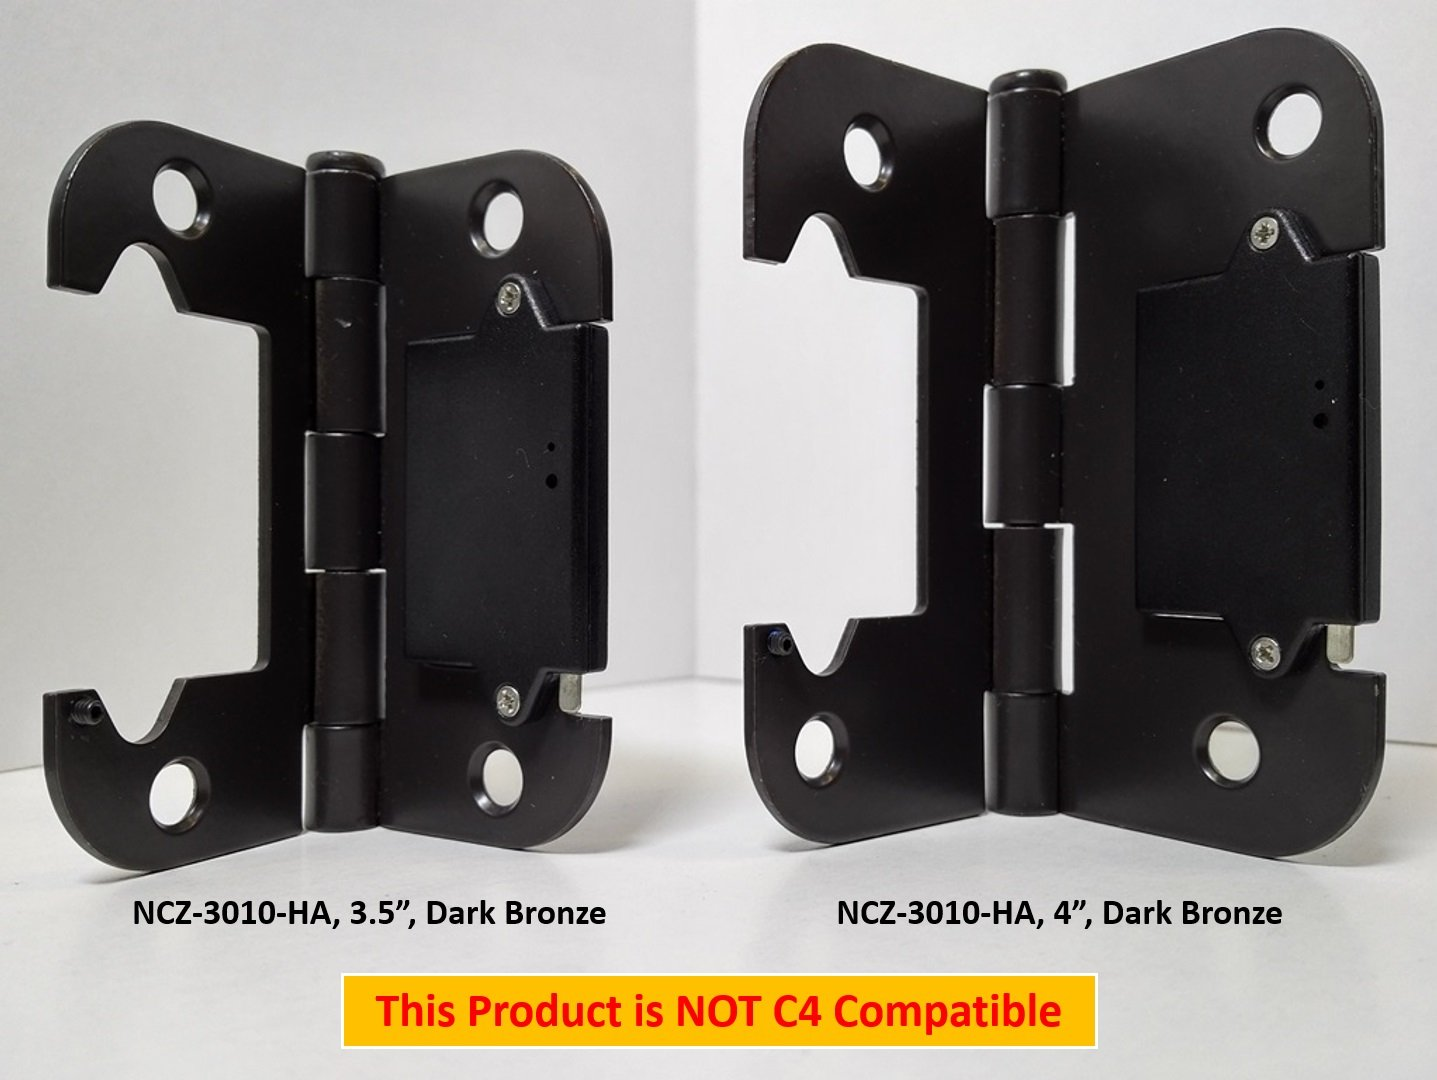 NYCE NCZ-3010-4-HA Door Hinge Sensor - 4'', Dark Bronze Finish